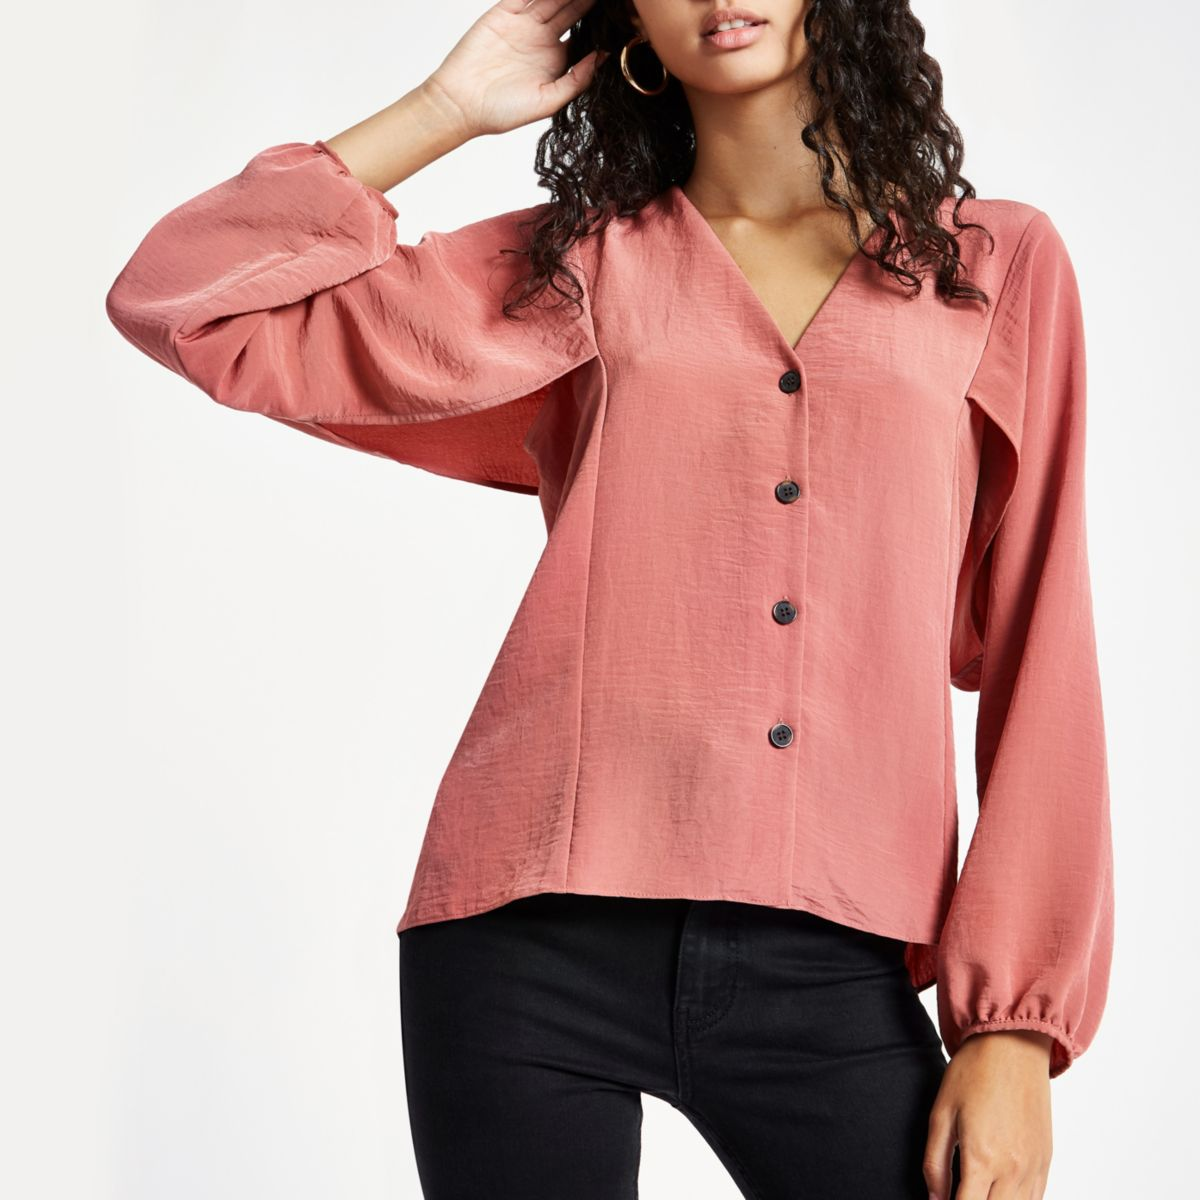 Pink button up v neck blouse